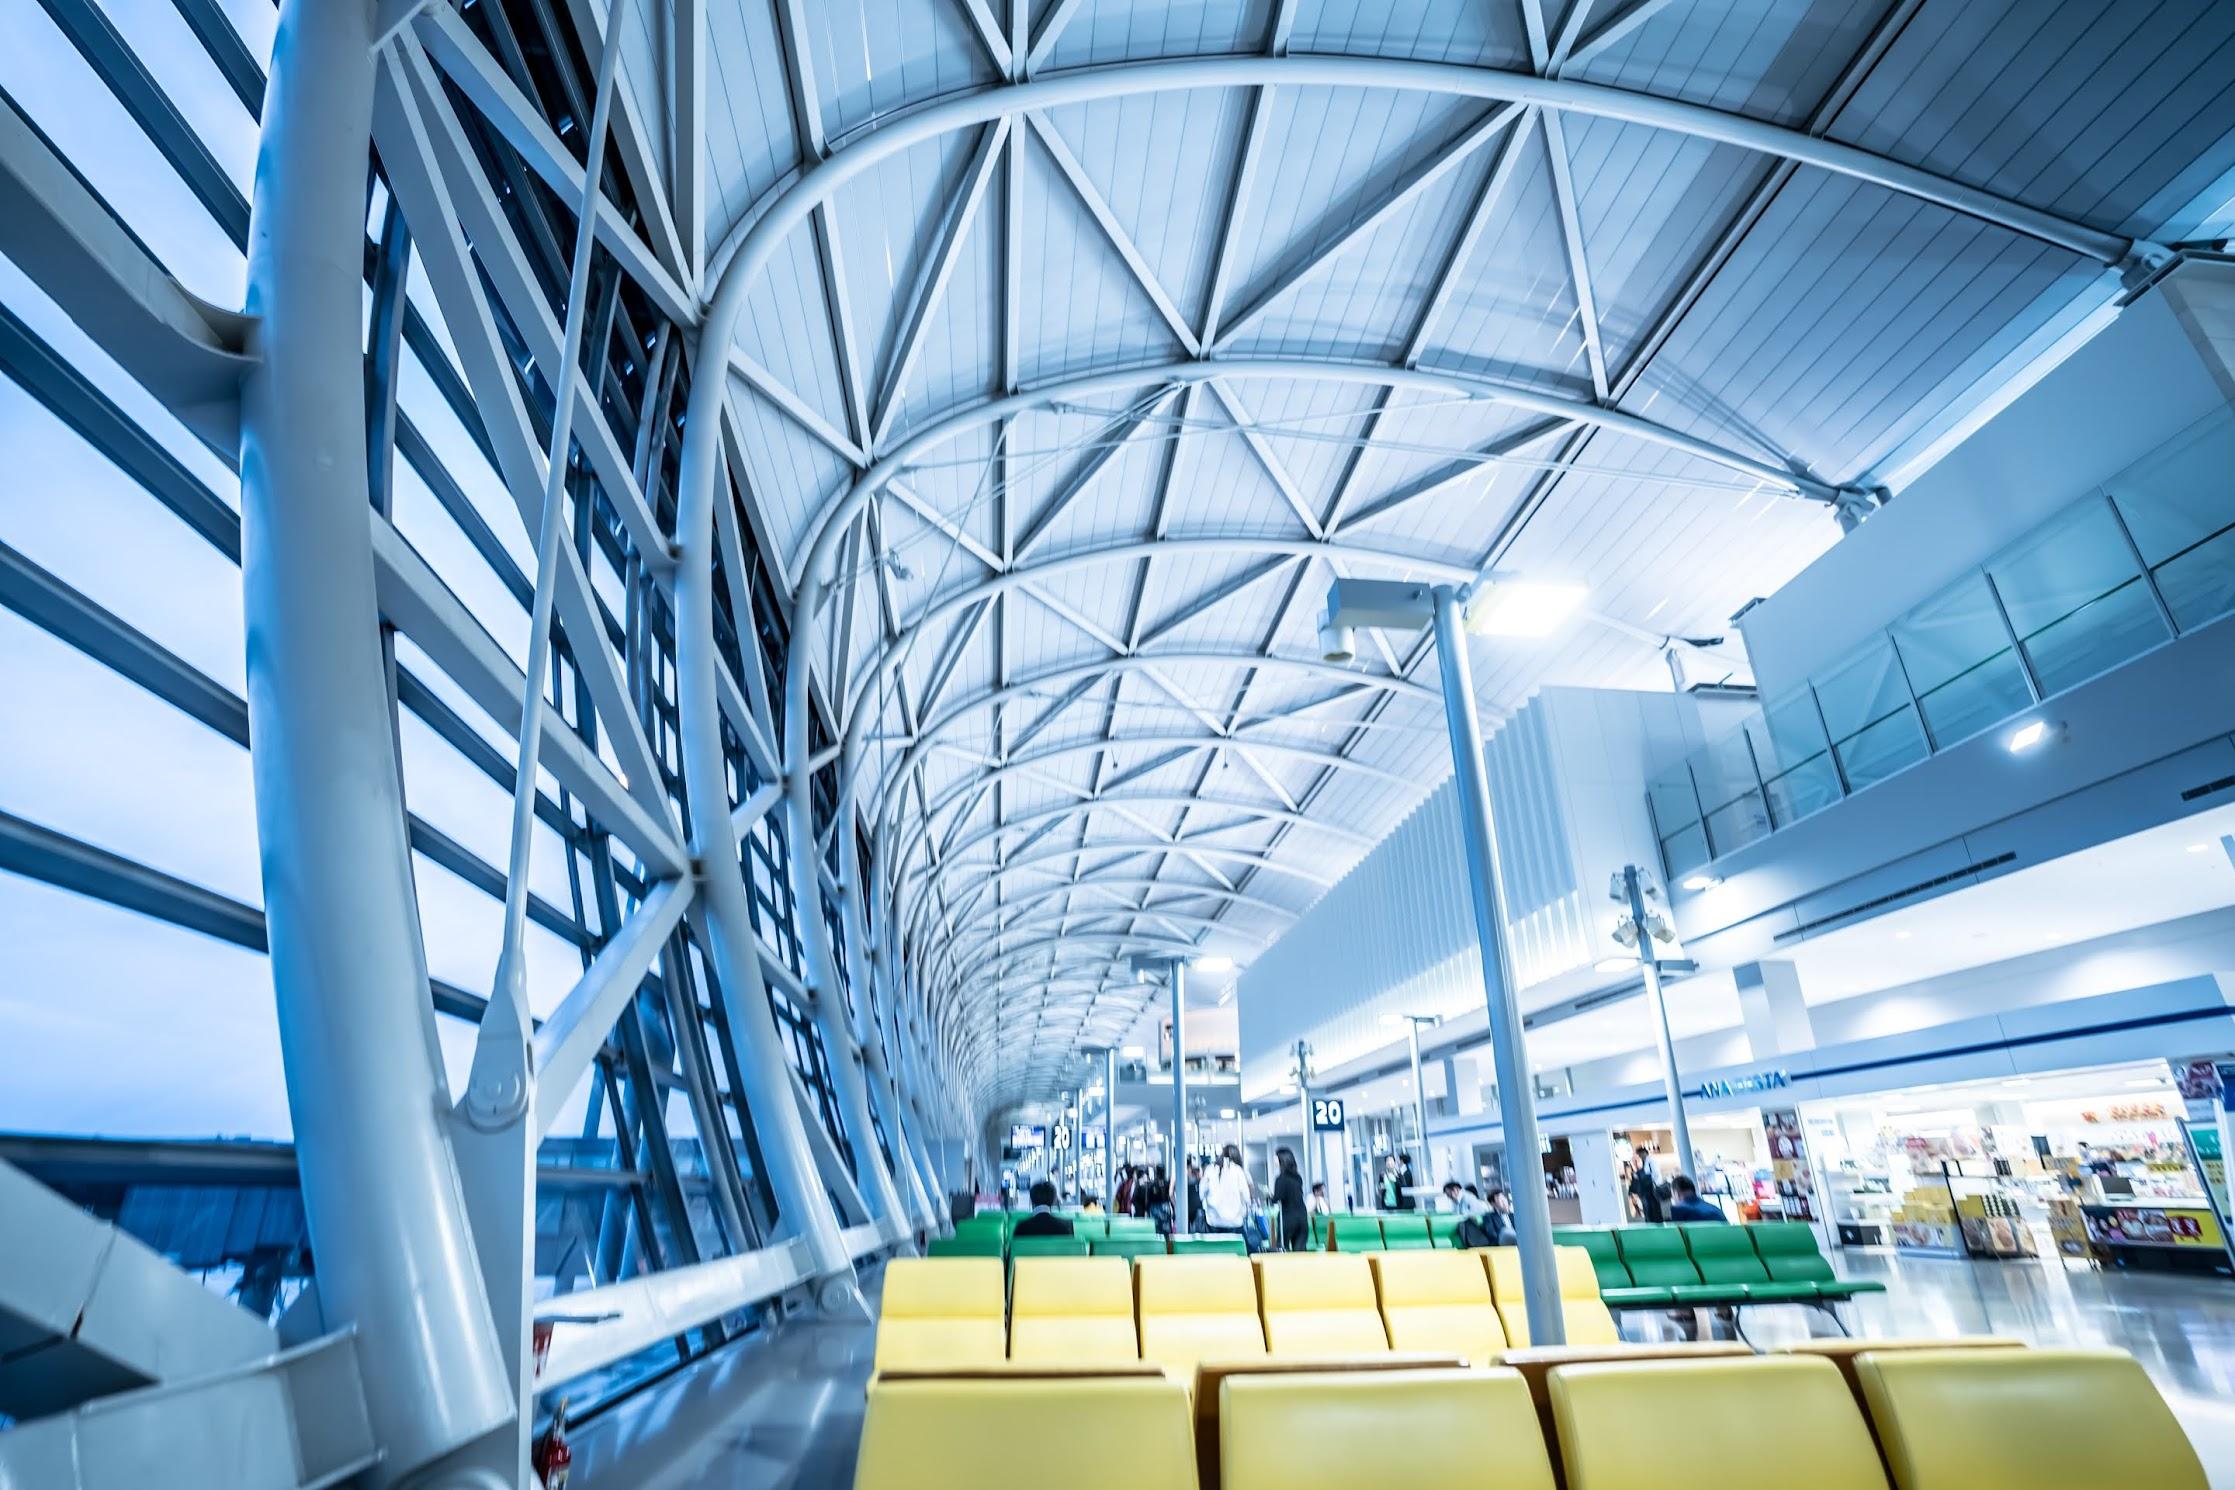 Kansai International Airport departure gate